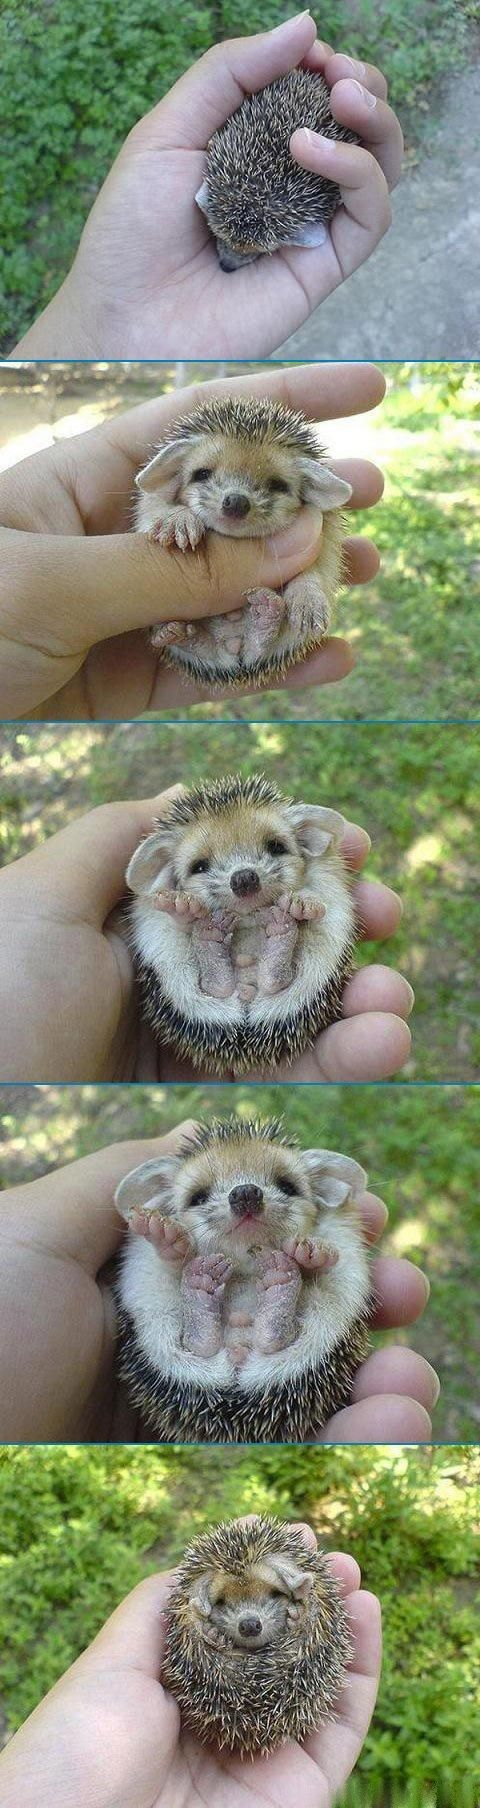 Hedgehog. Oh I want one.